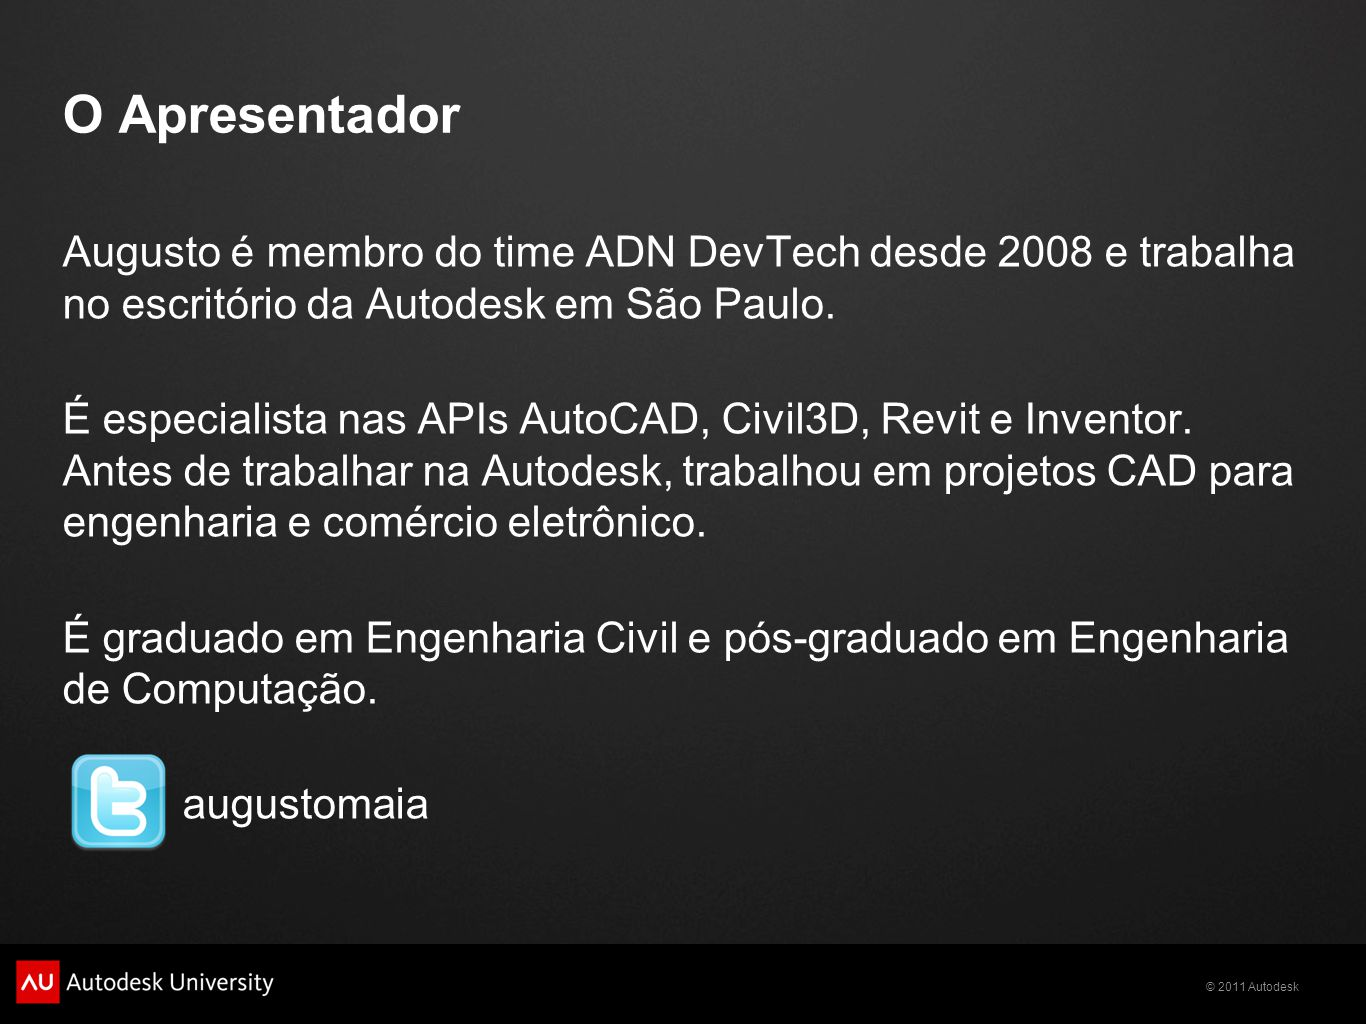 © 2011 Autodesk Autodesk Brasil Autodesk do Brasil - Site Corporativo www.autodesk.com.br Canal Autodesk do Brasil www.youtube.com/AutodeskBrasil Comunidade de Usuários Autodesk - Brasil communities.autodesk.com/brazil Facebook Oficial http://www.facebook.com/AutodeskBrasil Twitter Oficial @AutodeskBrasil